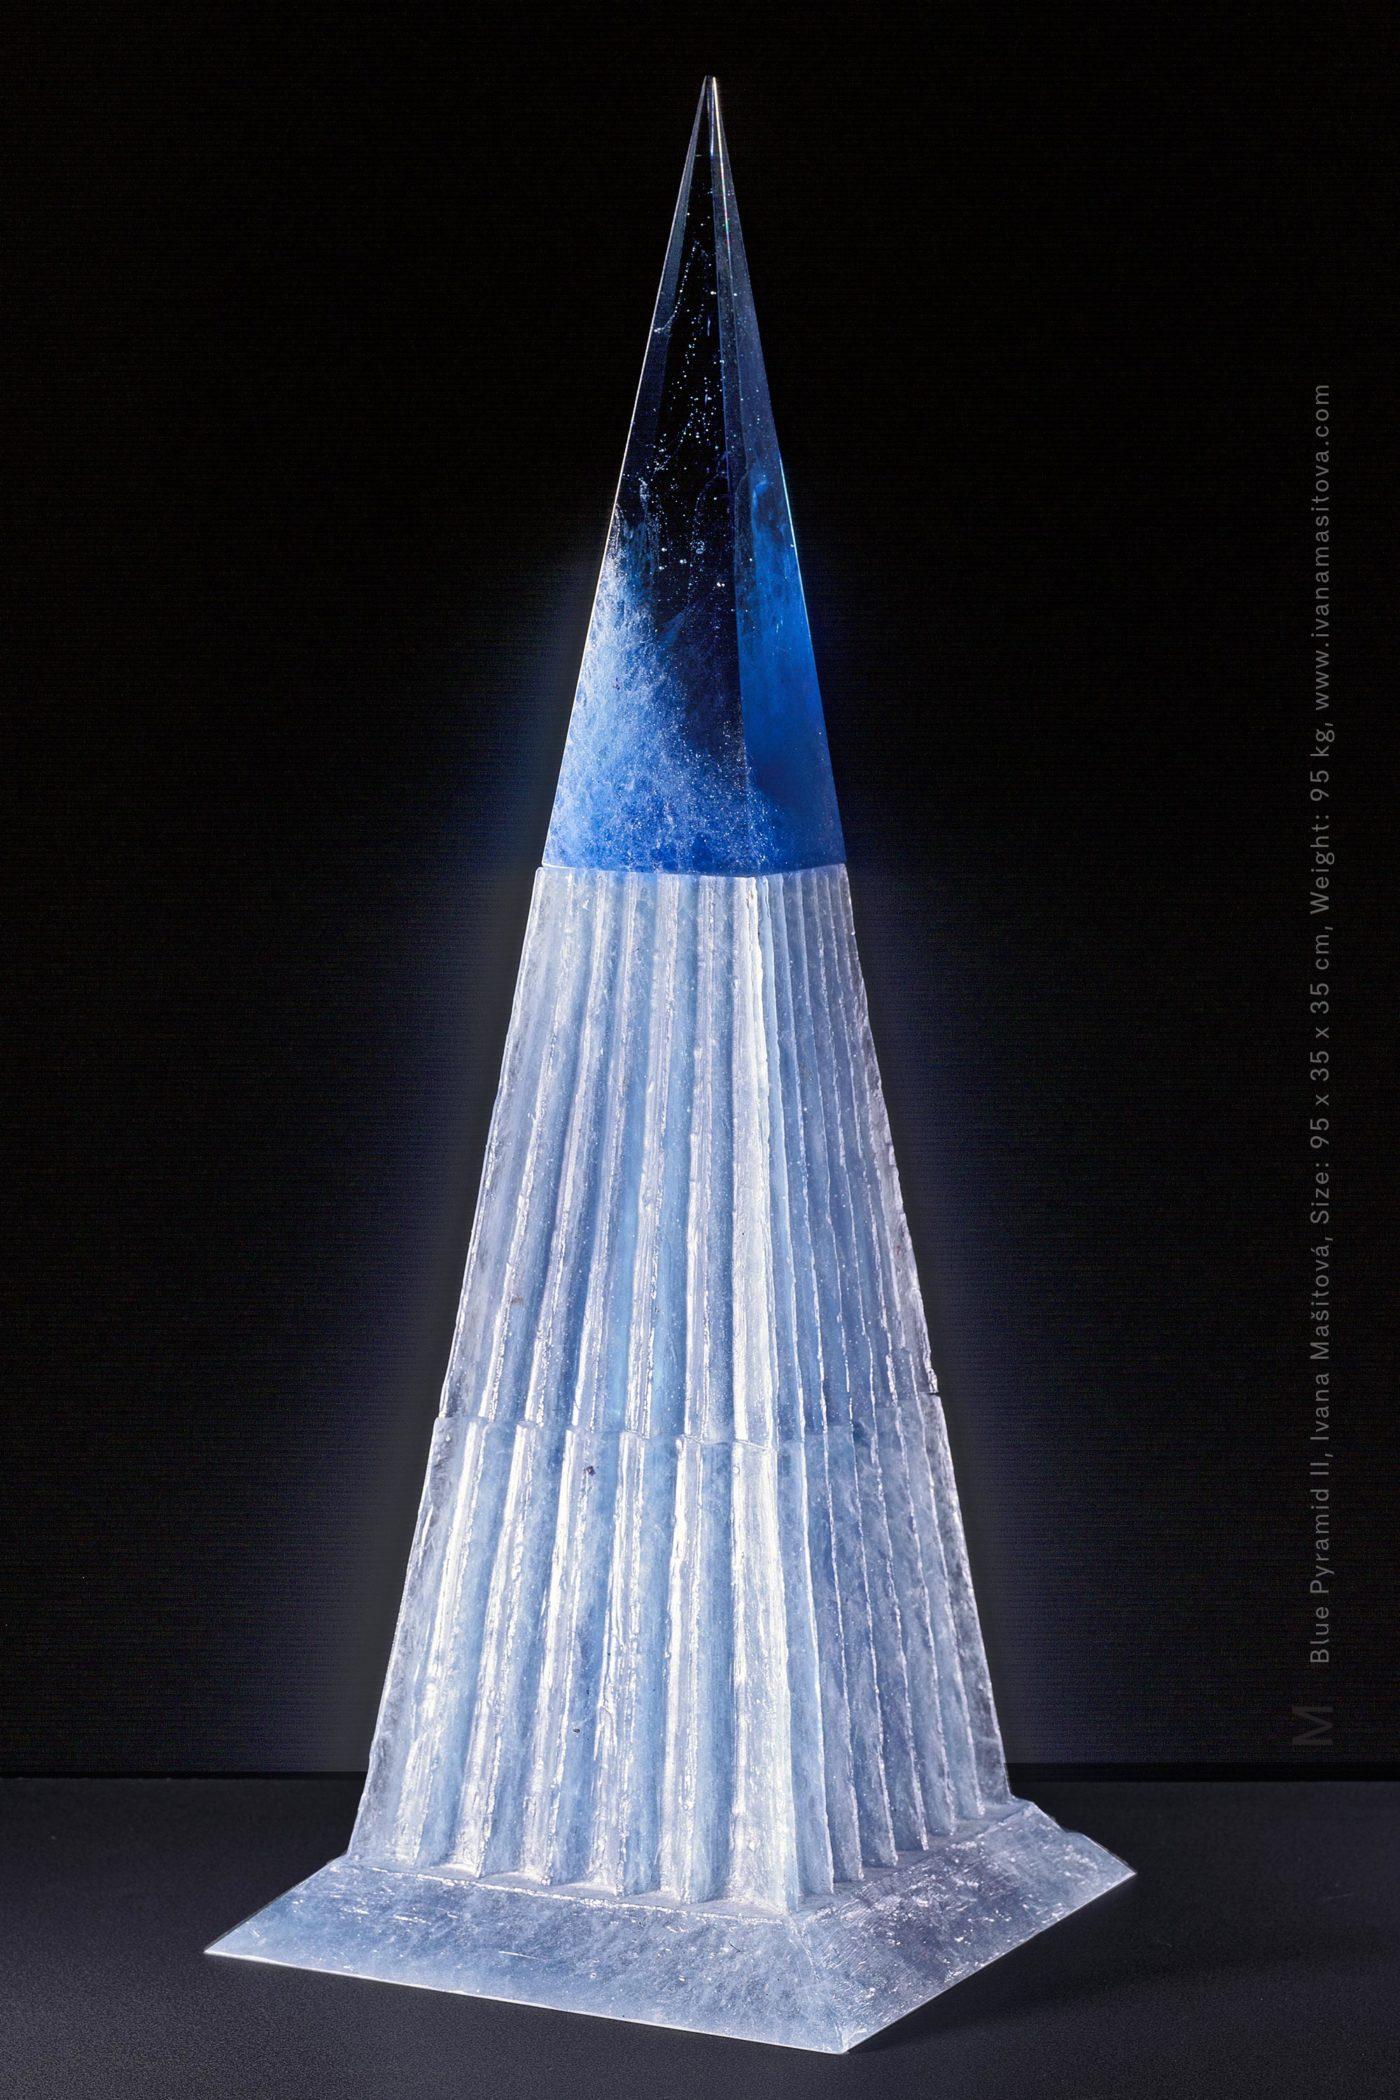 Modra-pyramida-II_Blue-Pyramid-II,95x35x35cm,95kg